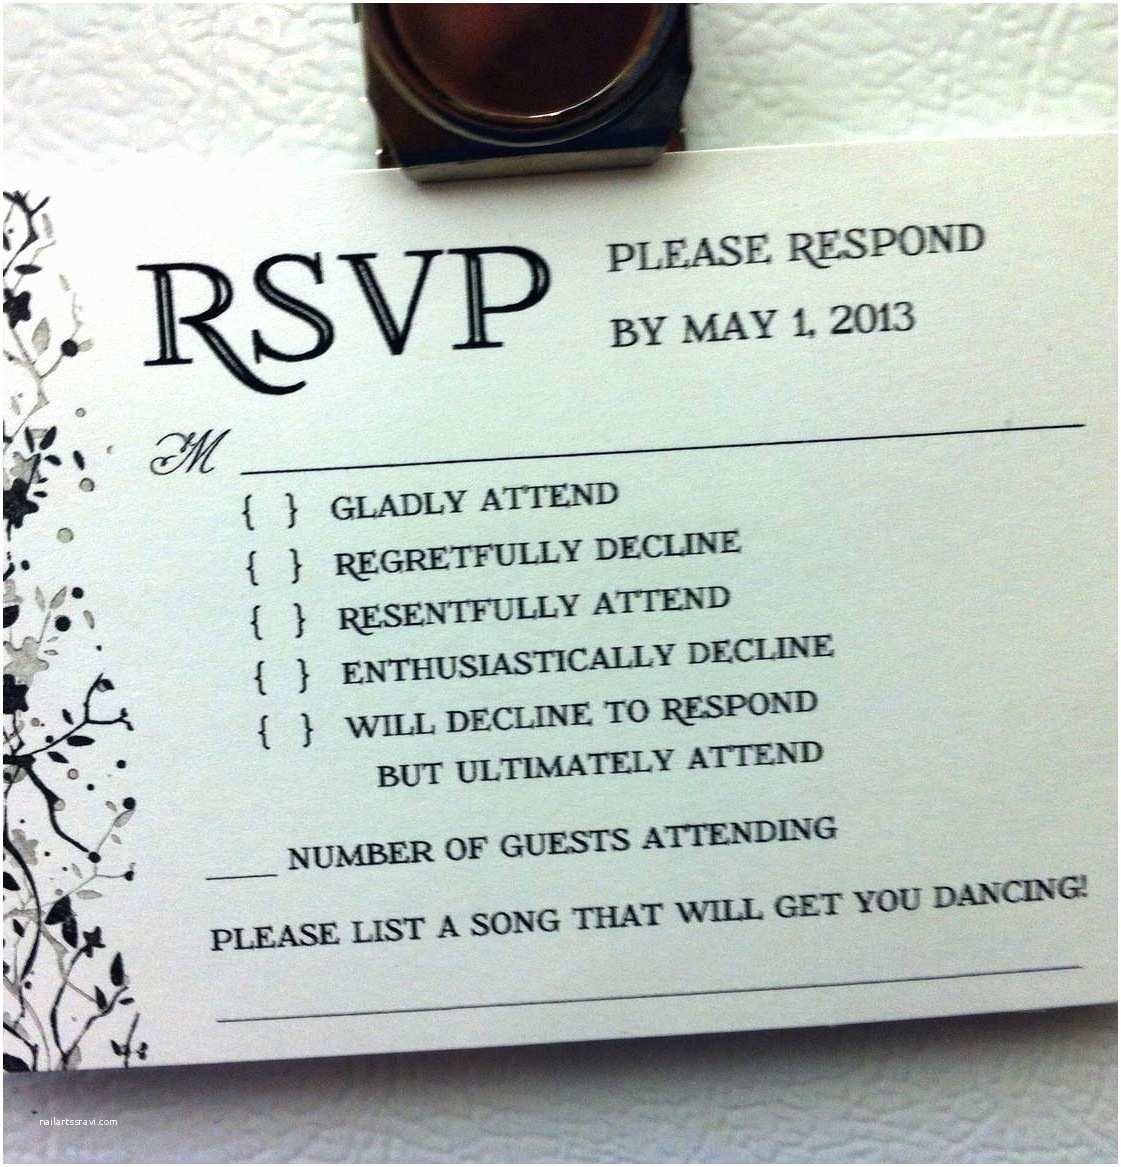 Funny Wedding Invitation Wording Buboblog A New York City Dad Smart Idea for A Wedding